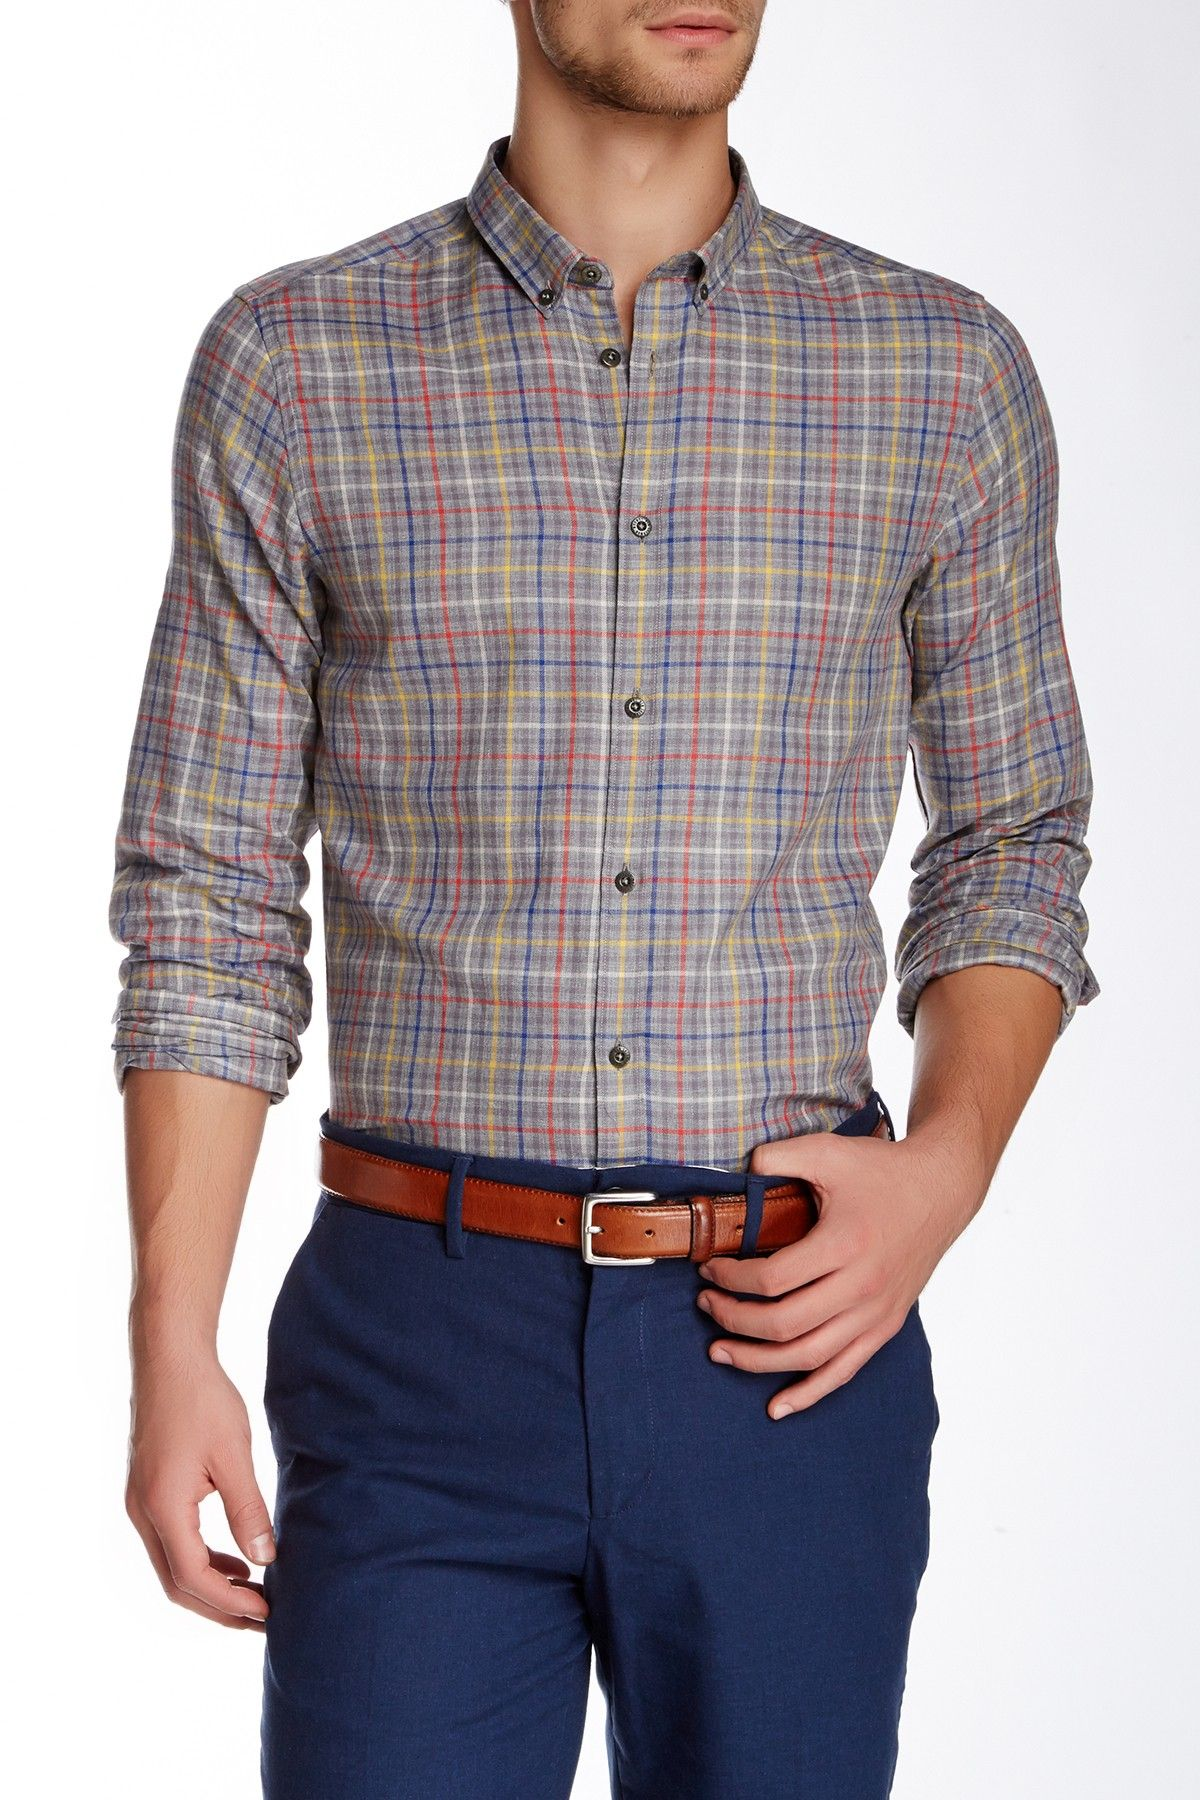 Flannel shirt with khaki pants  Ben Sherman  Long Sleeve Multi Colored Shirt  Multi coloured shirt